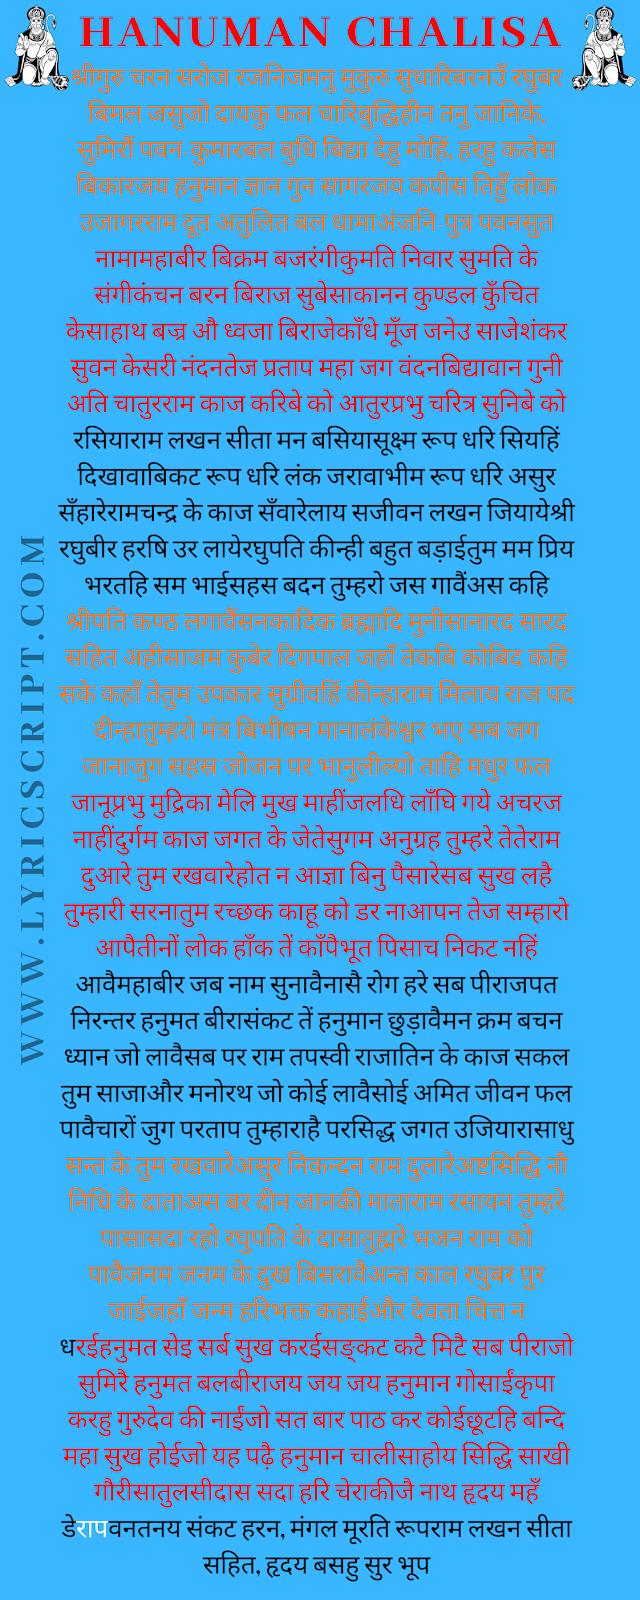 hanuman chalisa hindi image